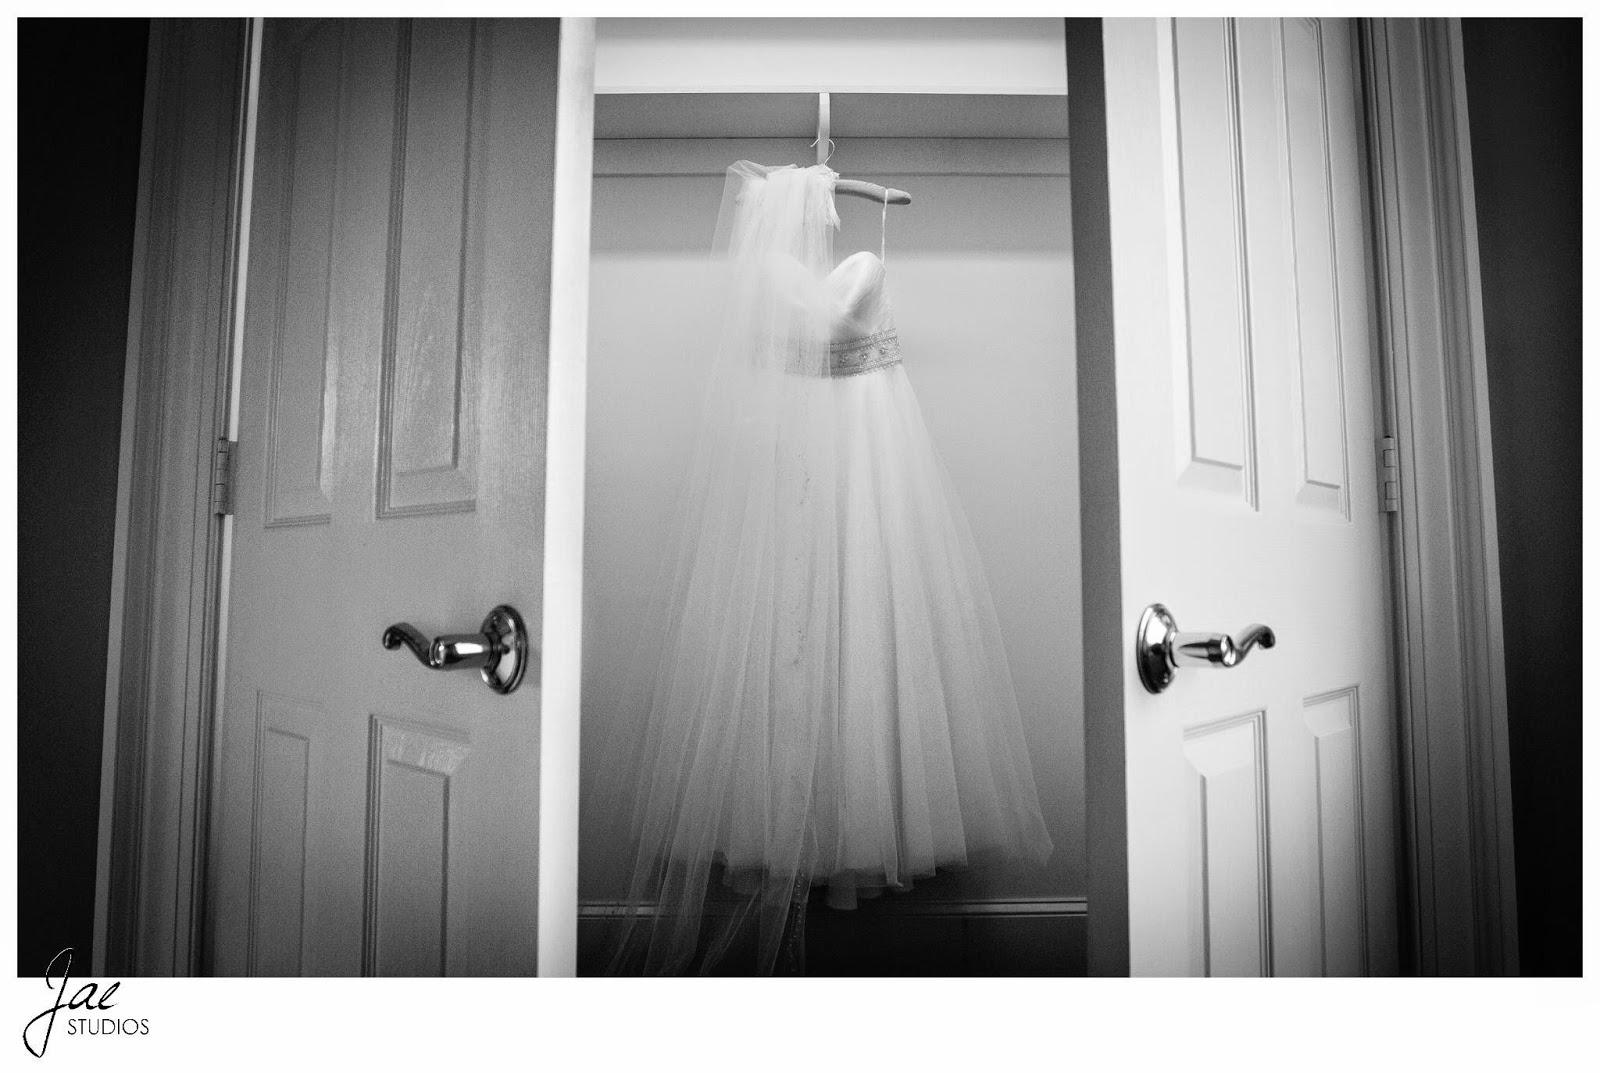 Jonathan and Julie, Bird cage, West Manor Estate, Wedding, Lynchburg, Virginia, Jae Studios, wedding dress, doors, opening, veil, black and white